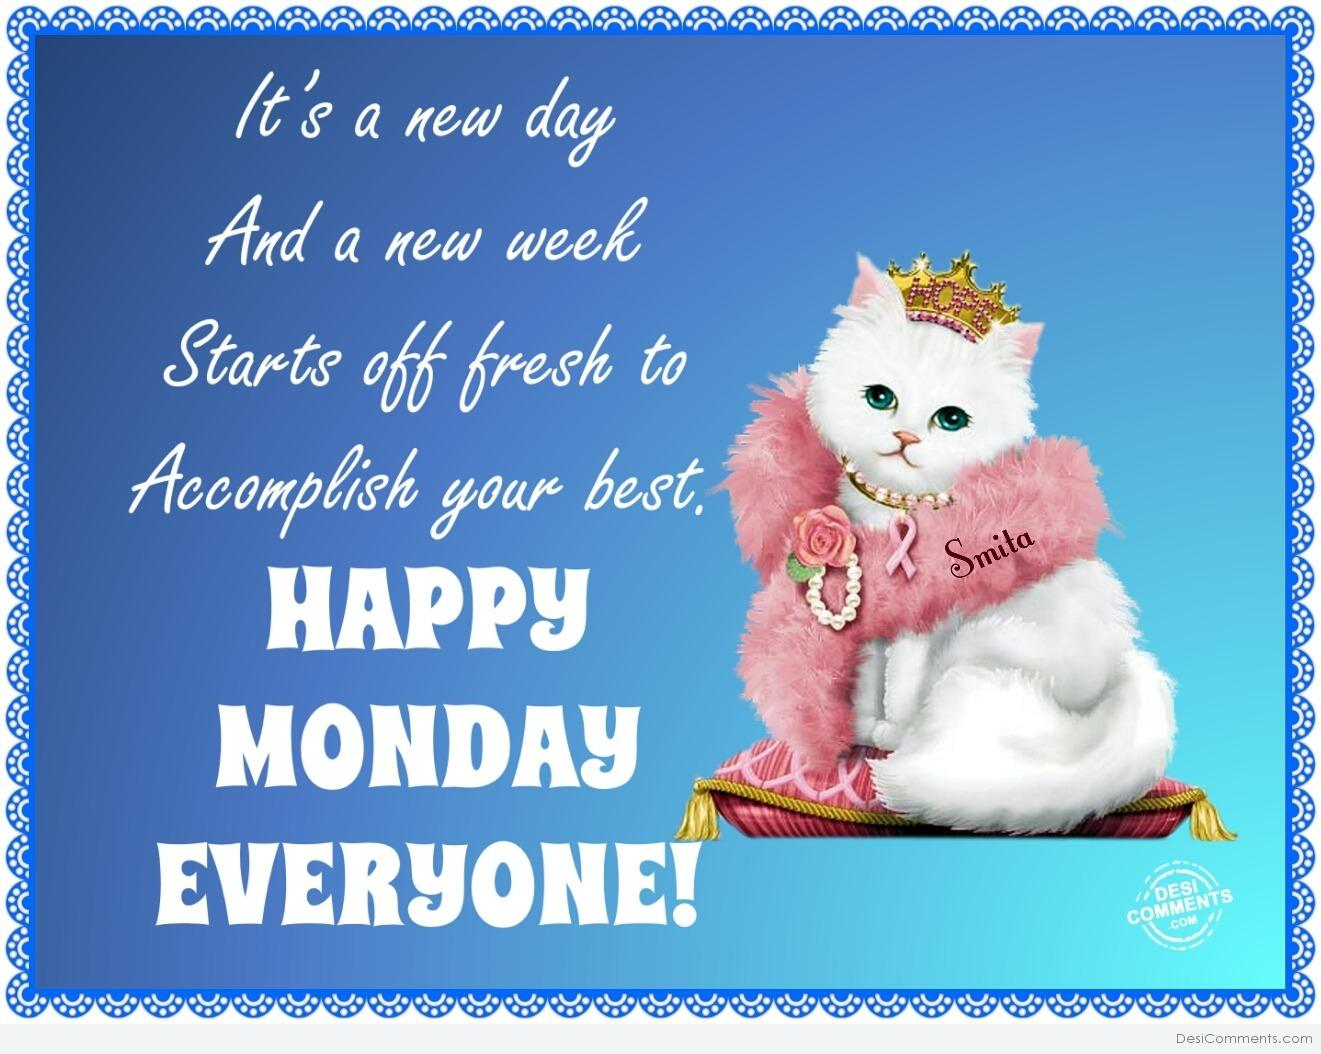 Monday blessings wallpaper wallpapersafari - Monday wallpaper ...